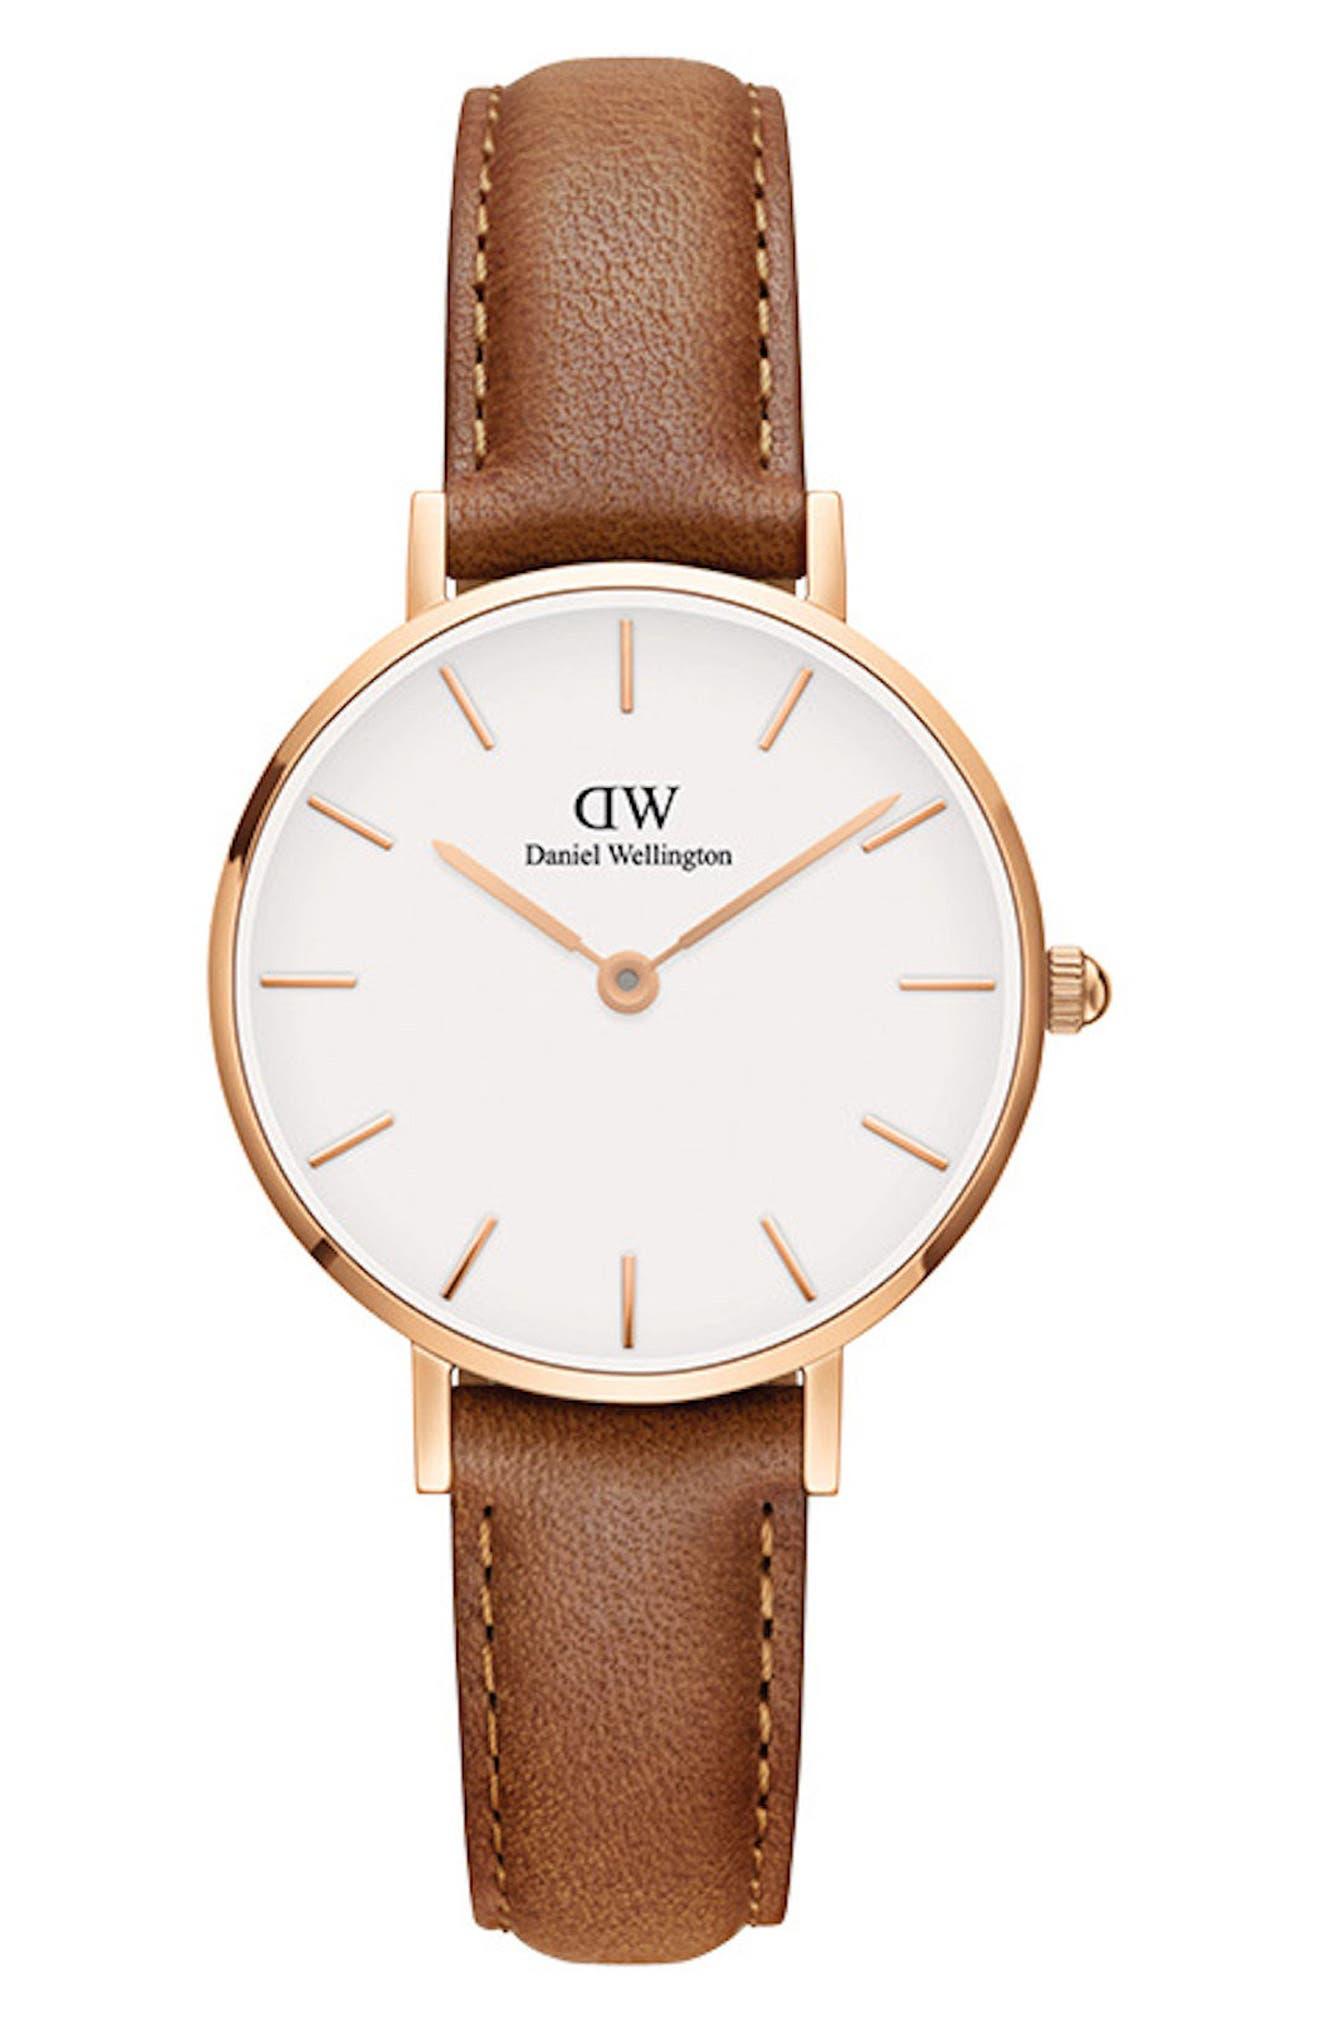 DANIEL WELLINGTON Classic Petite Leather Strap Watch, 28mm, Main, color, LIGHT BROWN/ WHITE/ ROSE GOLD